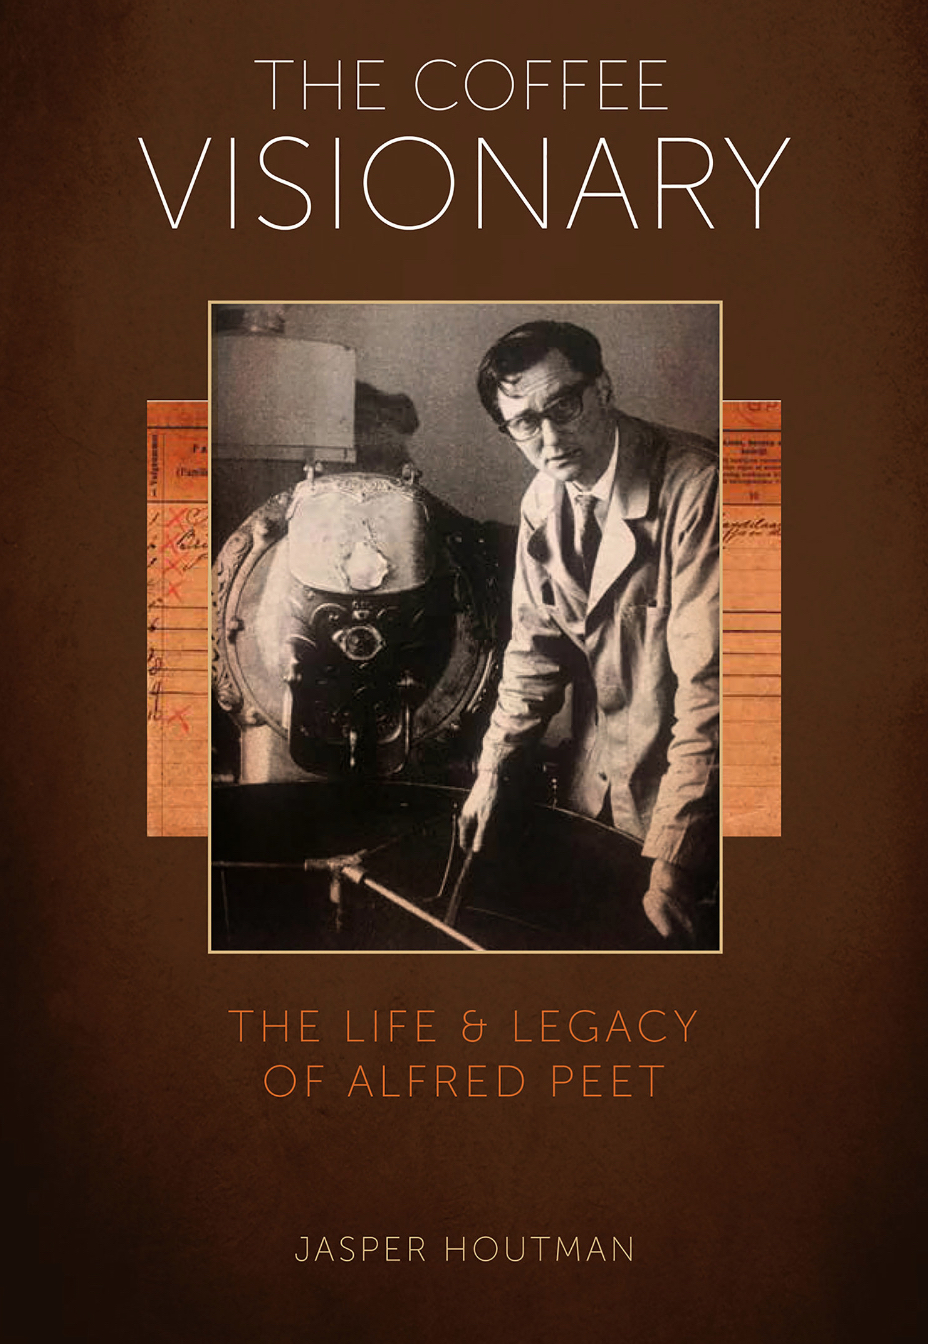 Alfred Peet biography